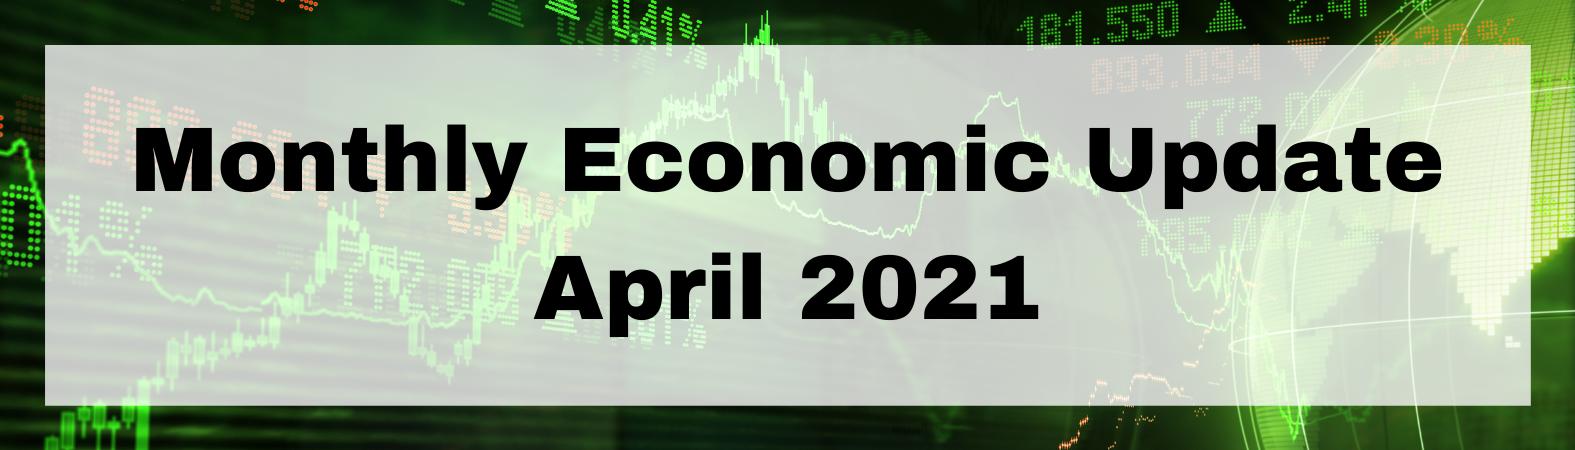 Monthly Economic Update April 2021 Thumbnail